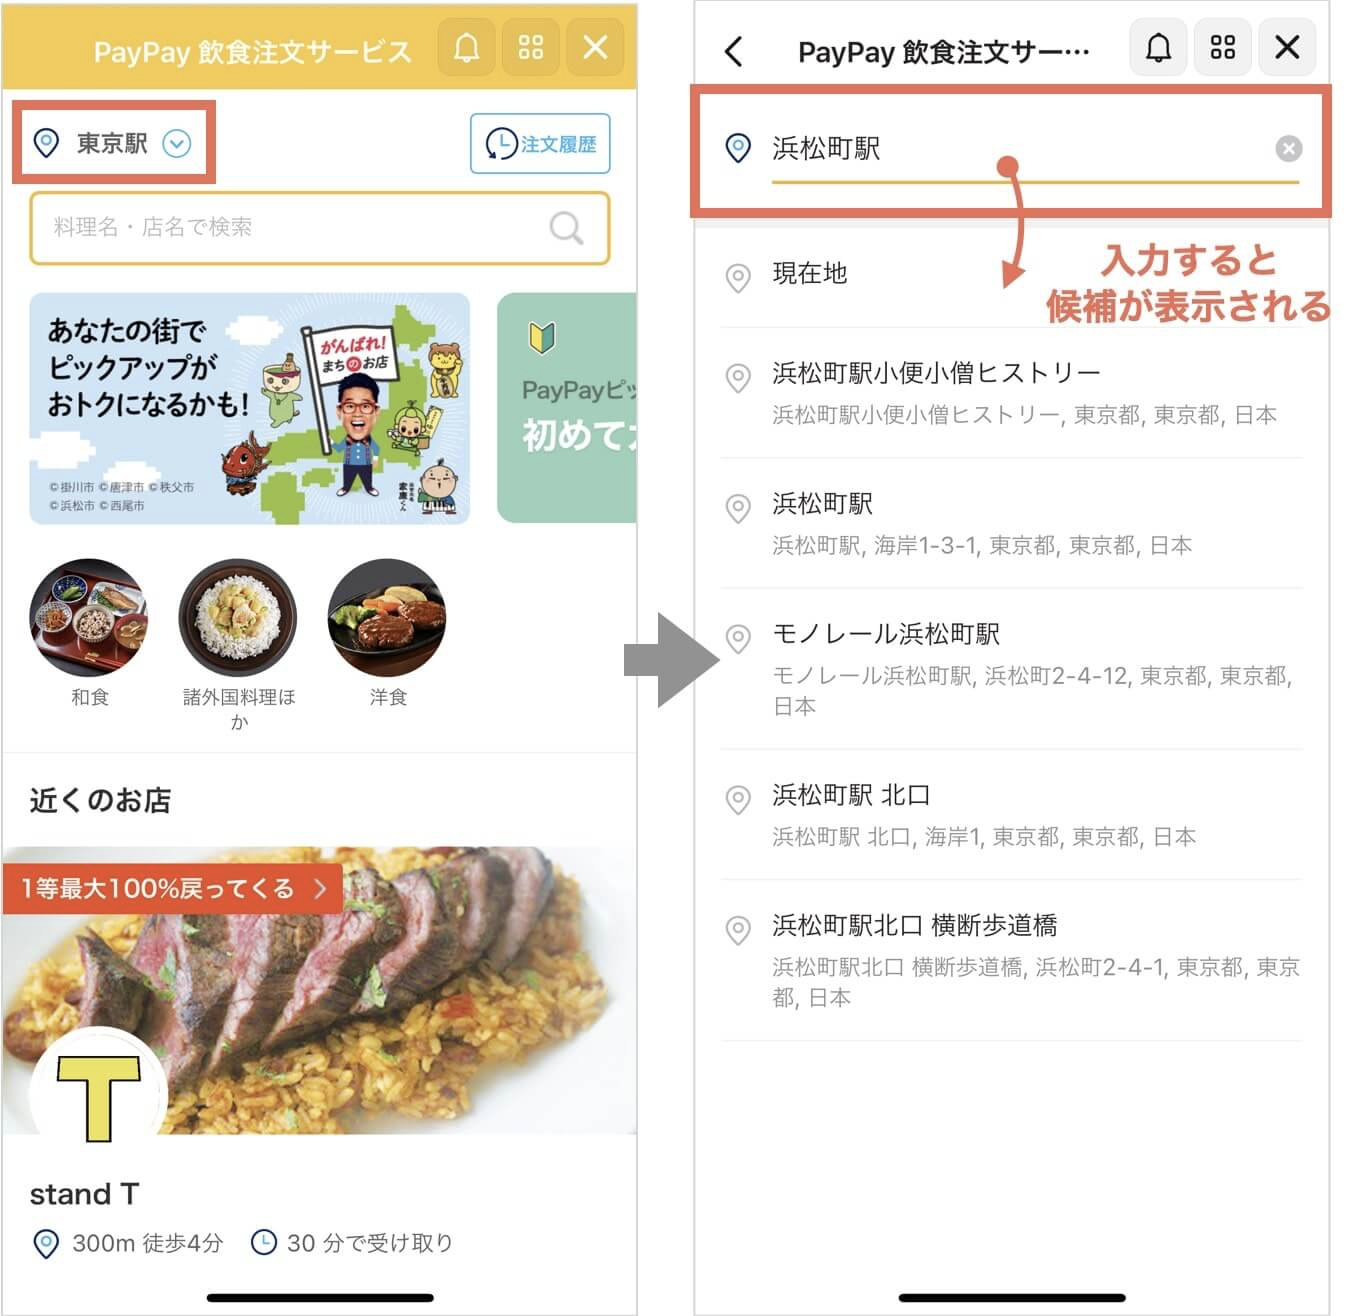 PayPayピックアップの使い方・口コミ評判